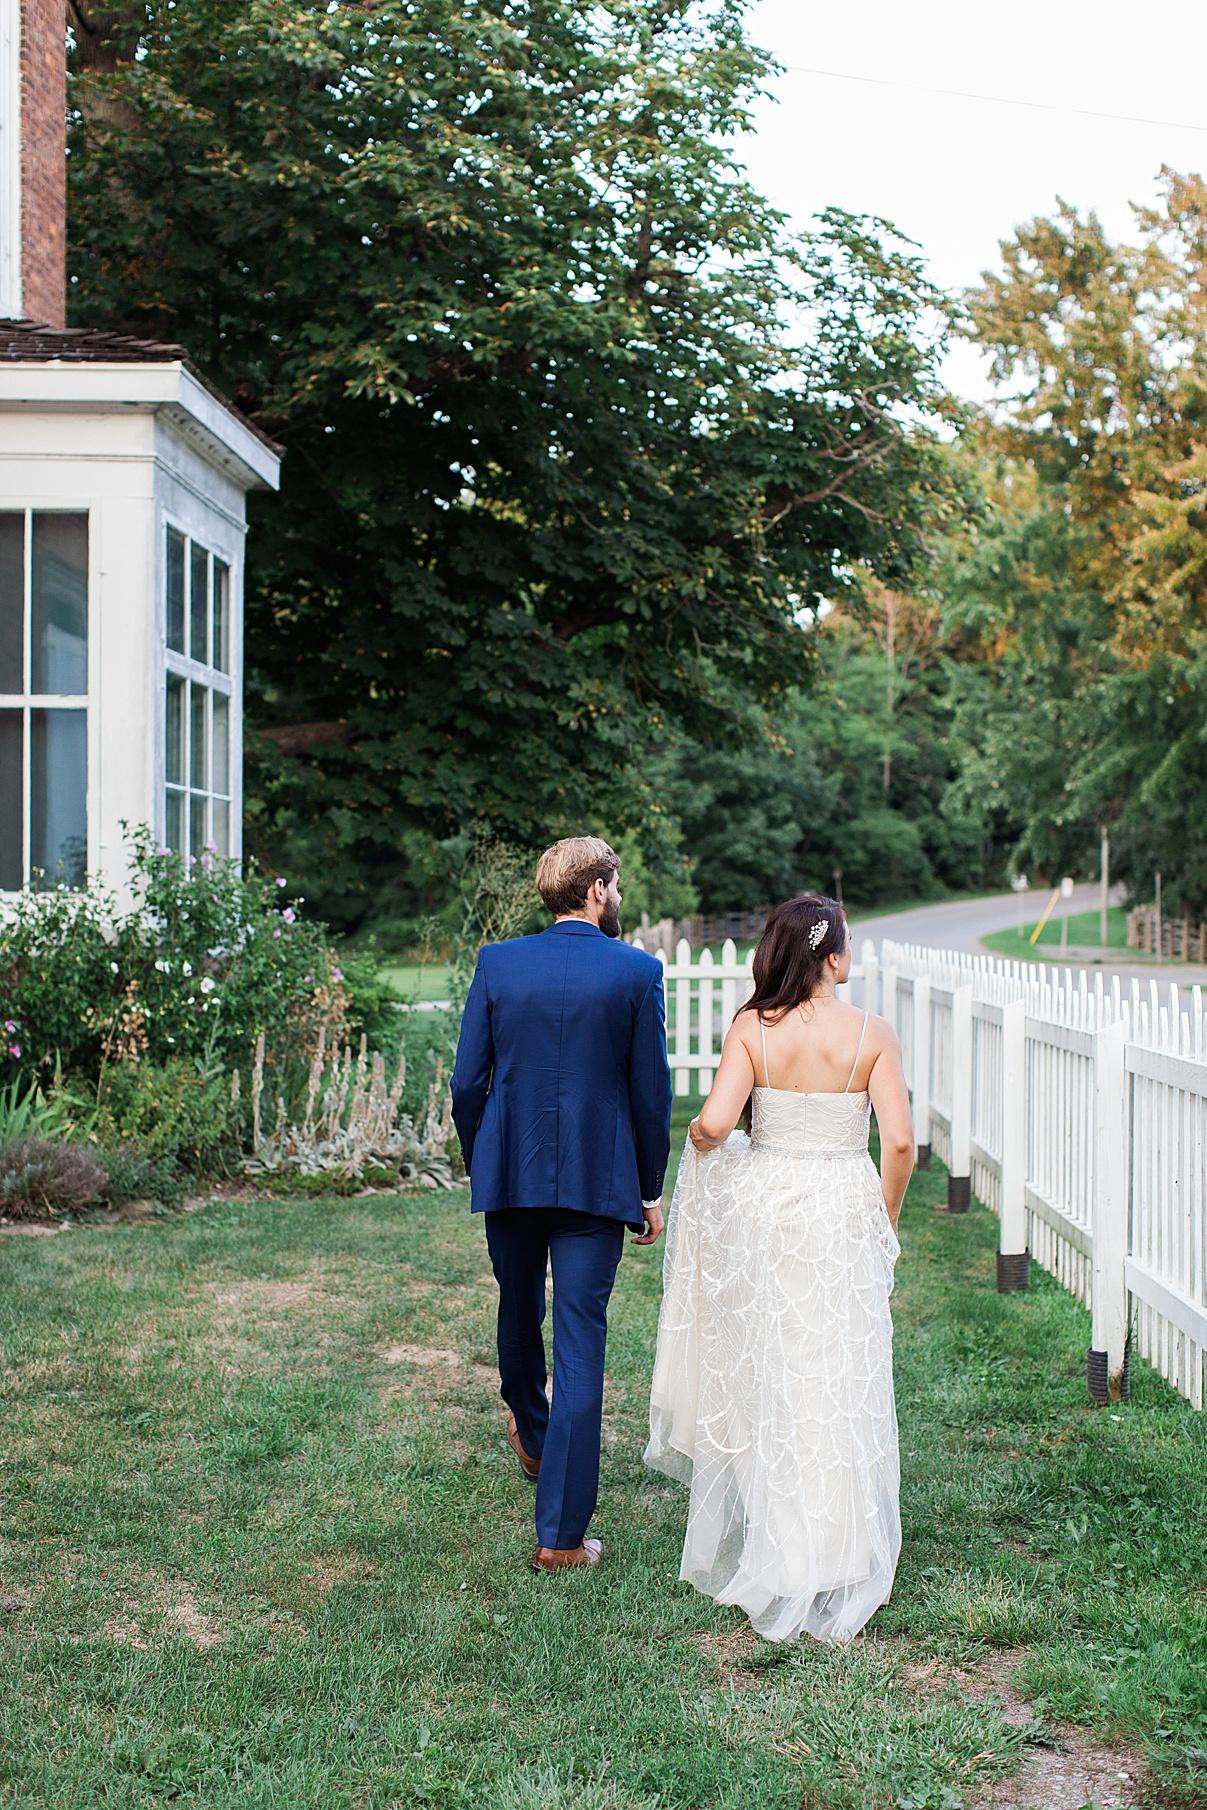 bride and groom walking | Balls Falls, Ontario Wedding| Ontario Wedding Photographer| Toronto Wedding Photographer| 3Photography| 3photography.ca